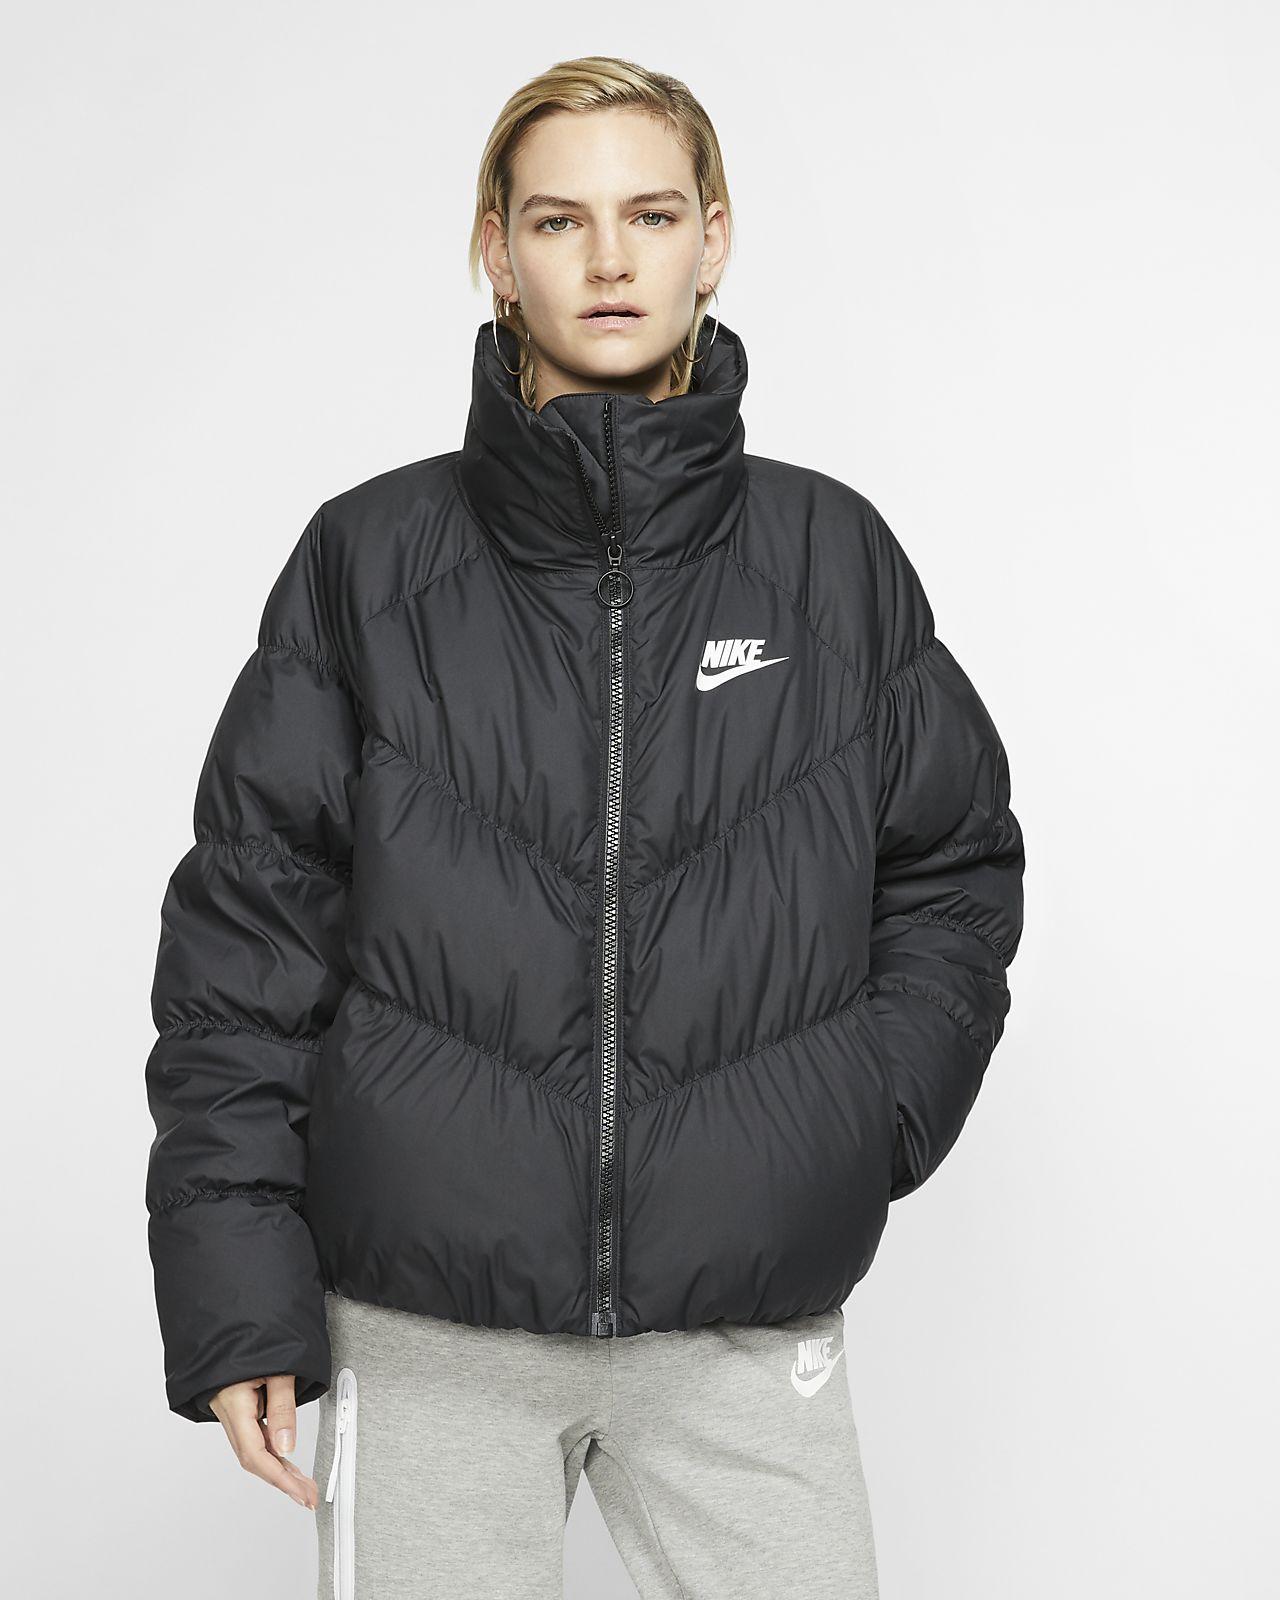 Casaco Nike Sportswear para mulher